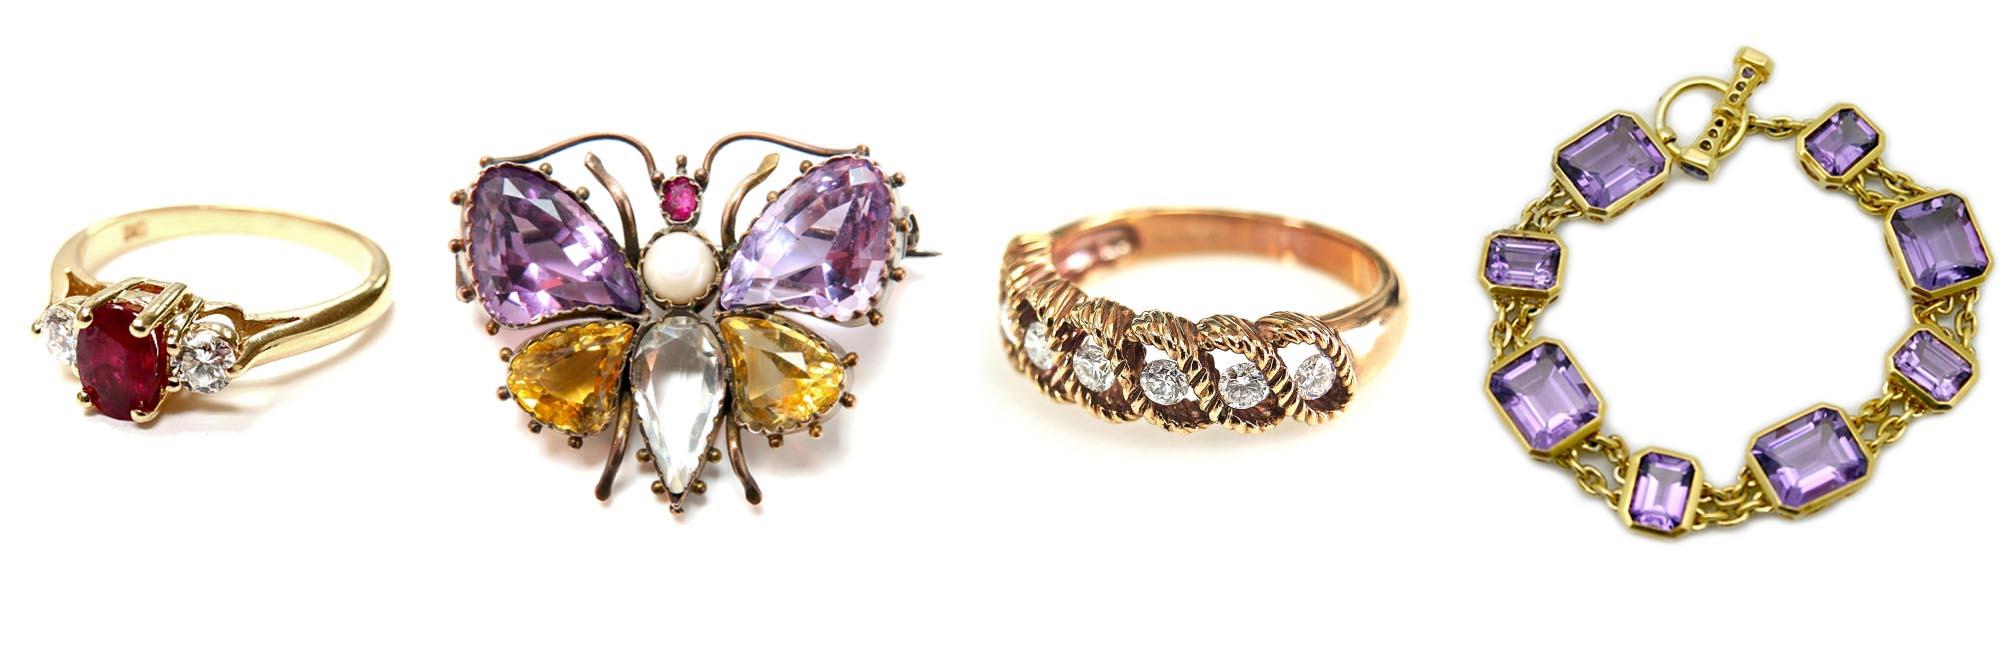 Antiques Amp Fine Jewellery In Toronto Cynthia Findlay